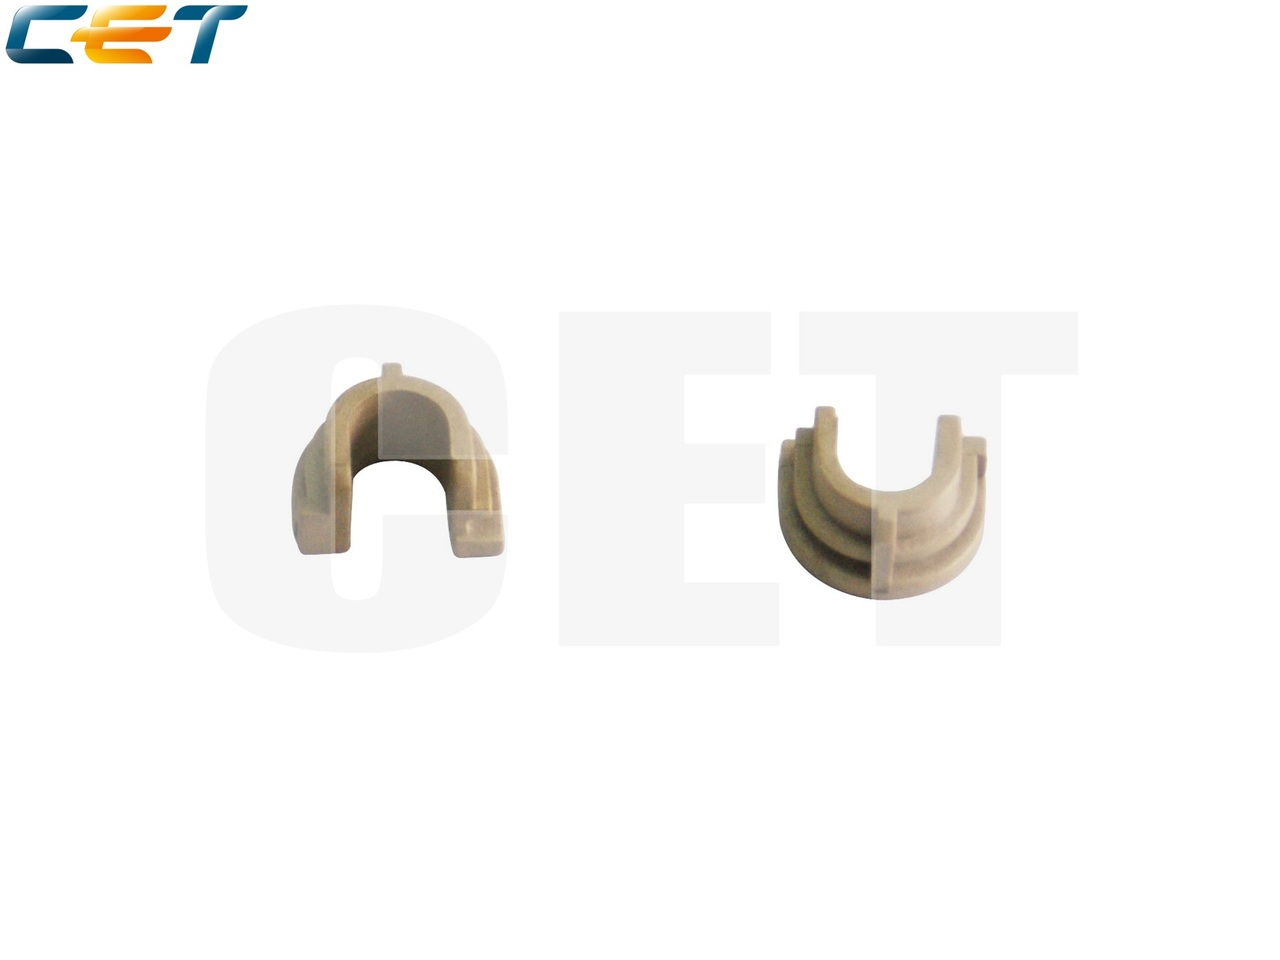 Бушинг резинового вала для HP LaserJet P1006 (CET),CET3788